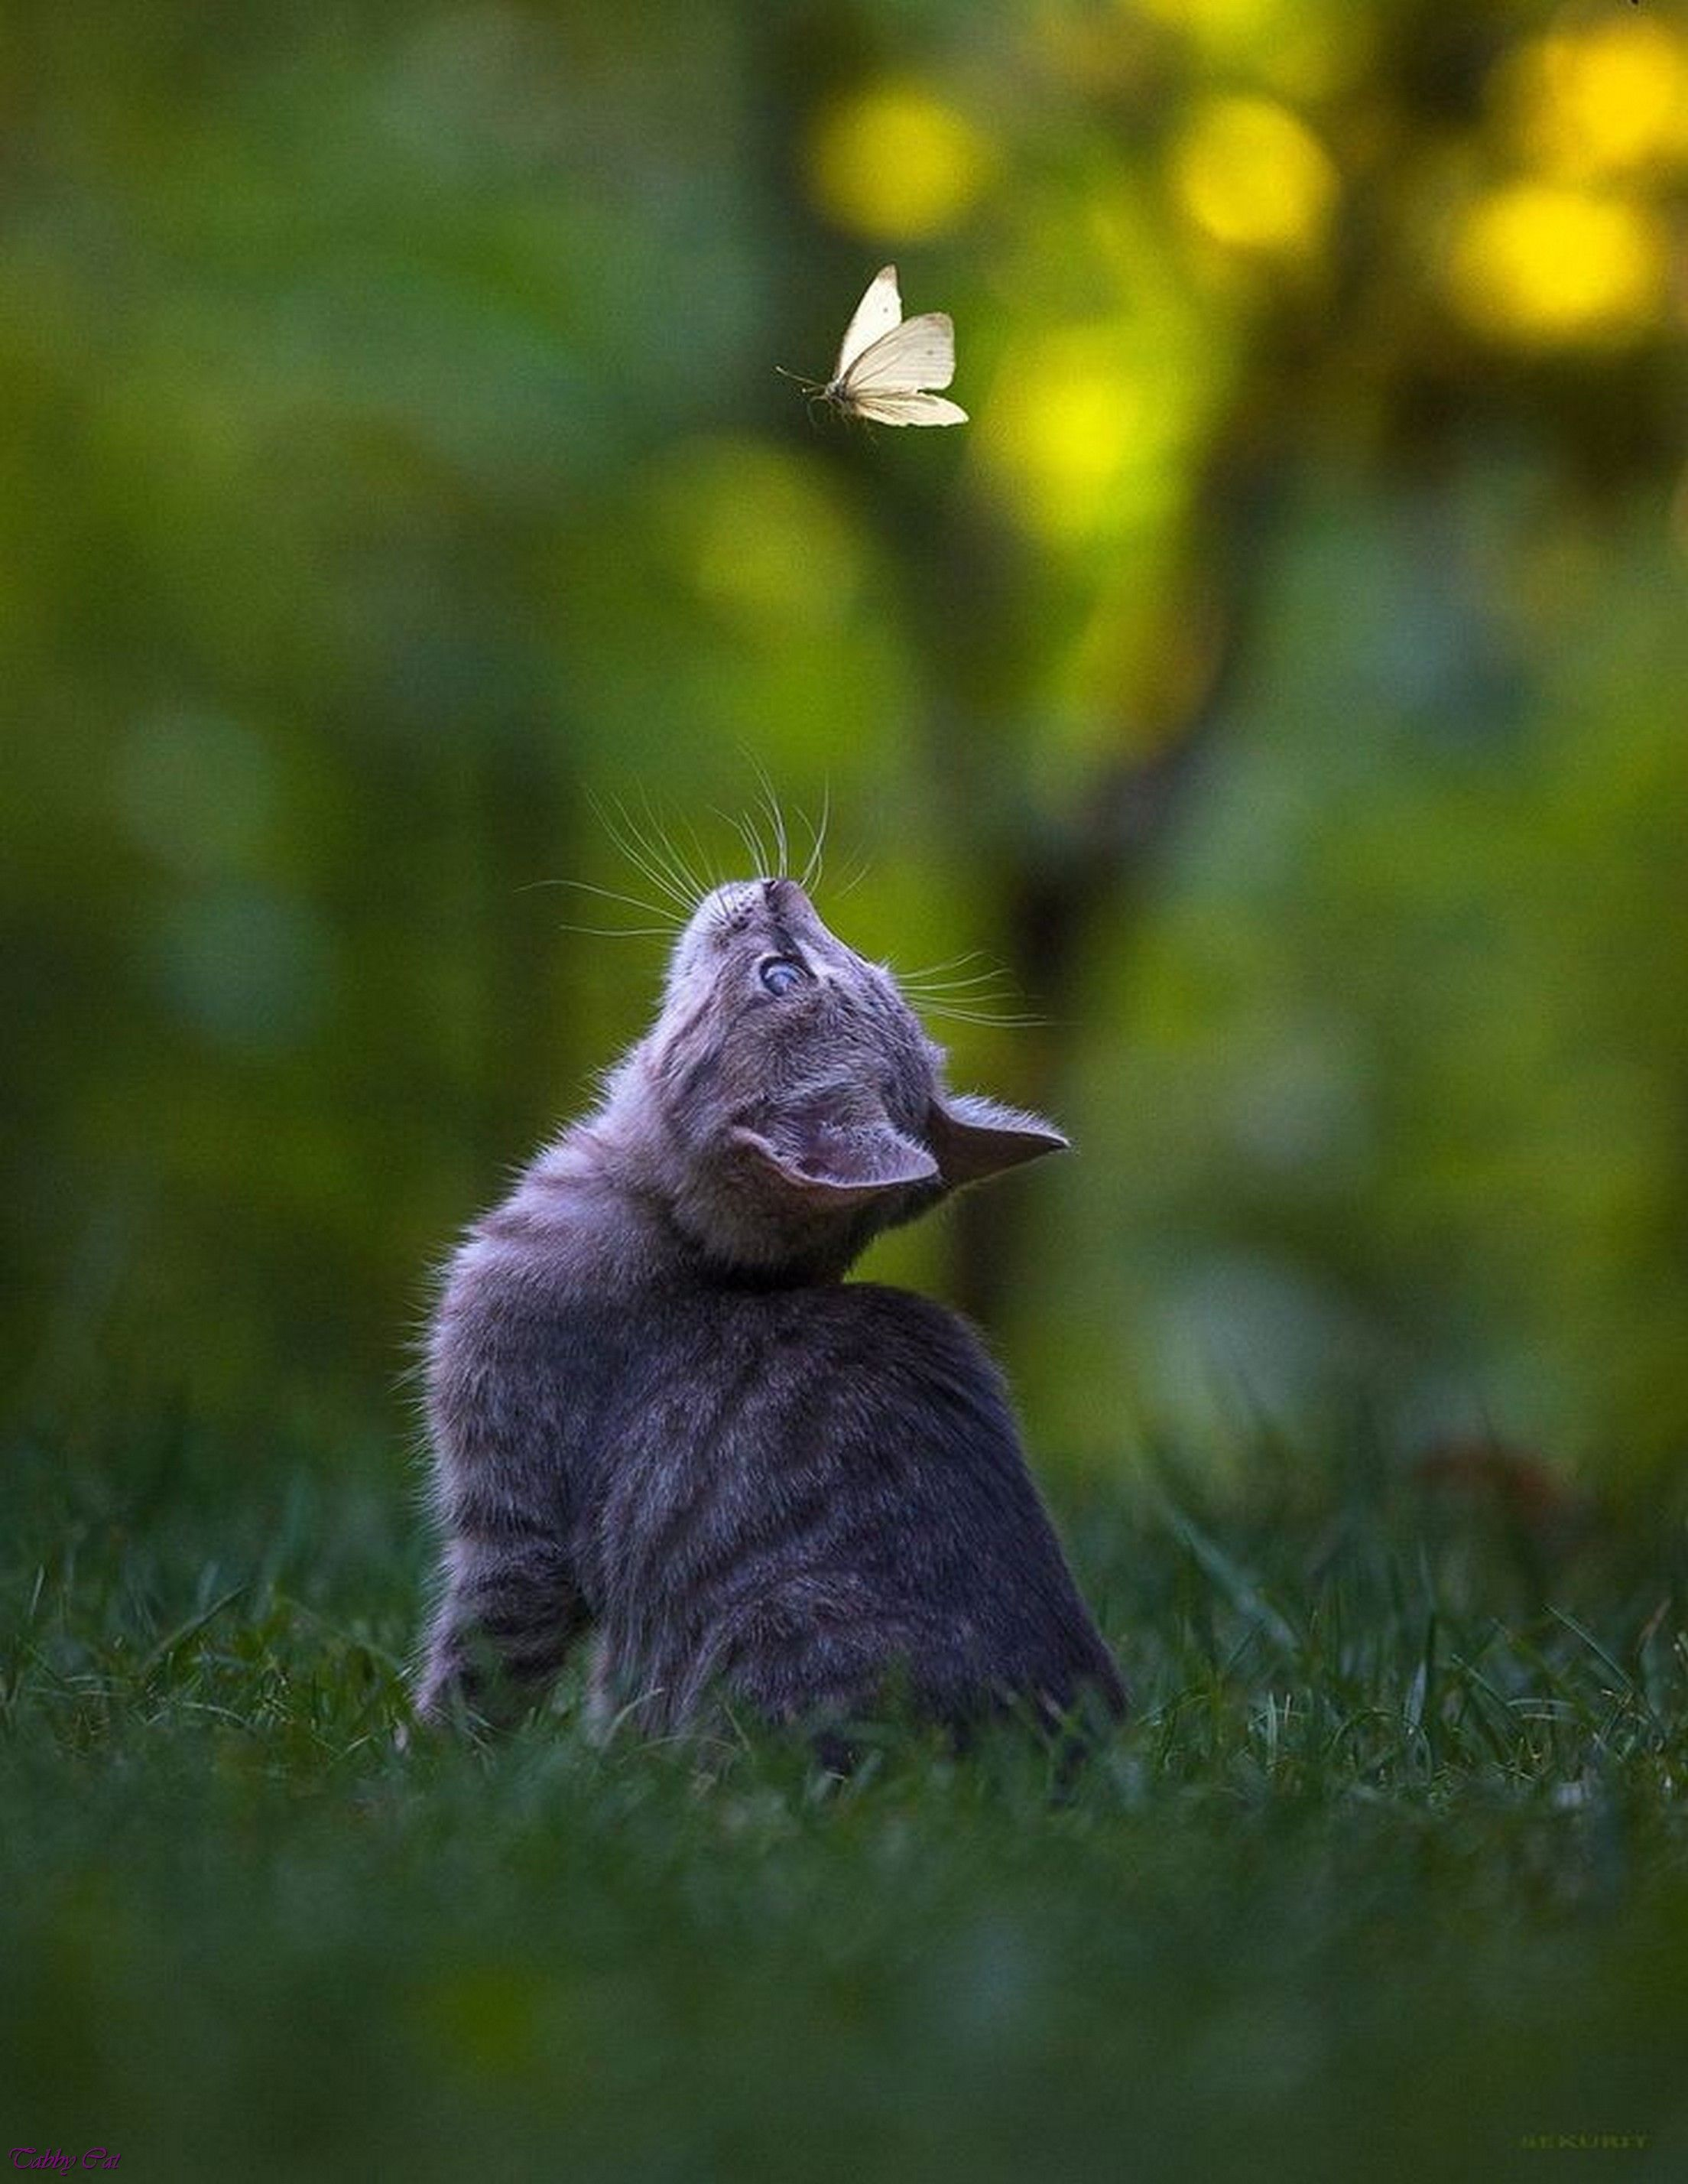 Tabby Cat Kittens Baby Orange Tabby Cats Black And White Tabby Cat Orange Tabby Cats Adults Gray And White Tabby Cat Katzen Susseste Haustiere Hubsche Katzen